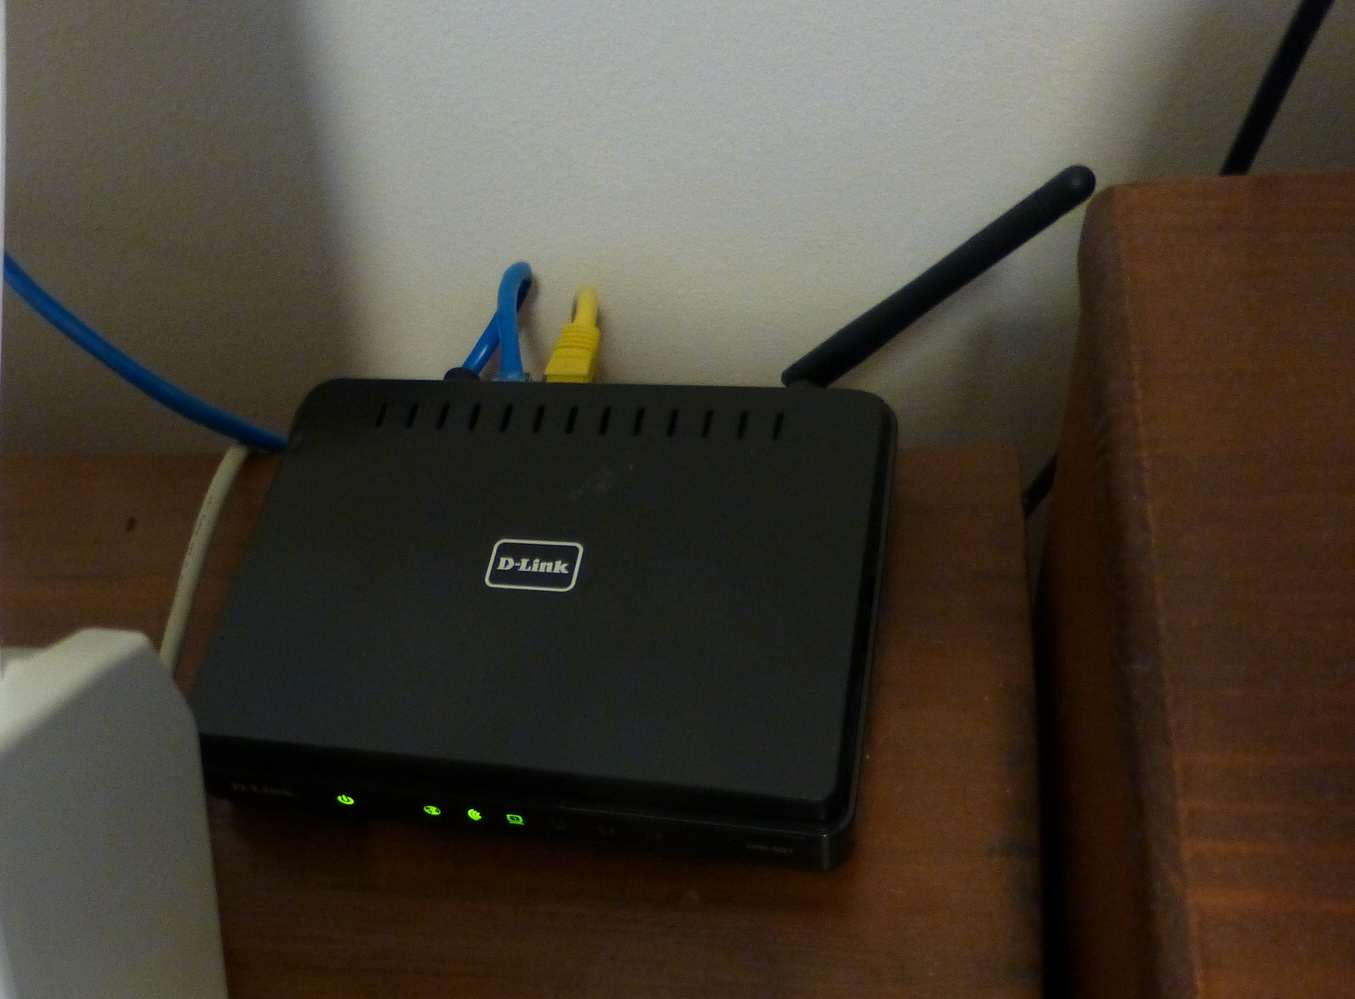 Как подключиться к Wi-Fi без пароля 4